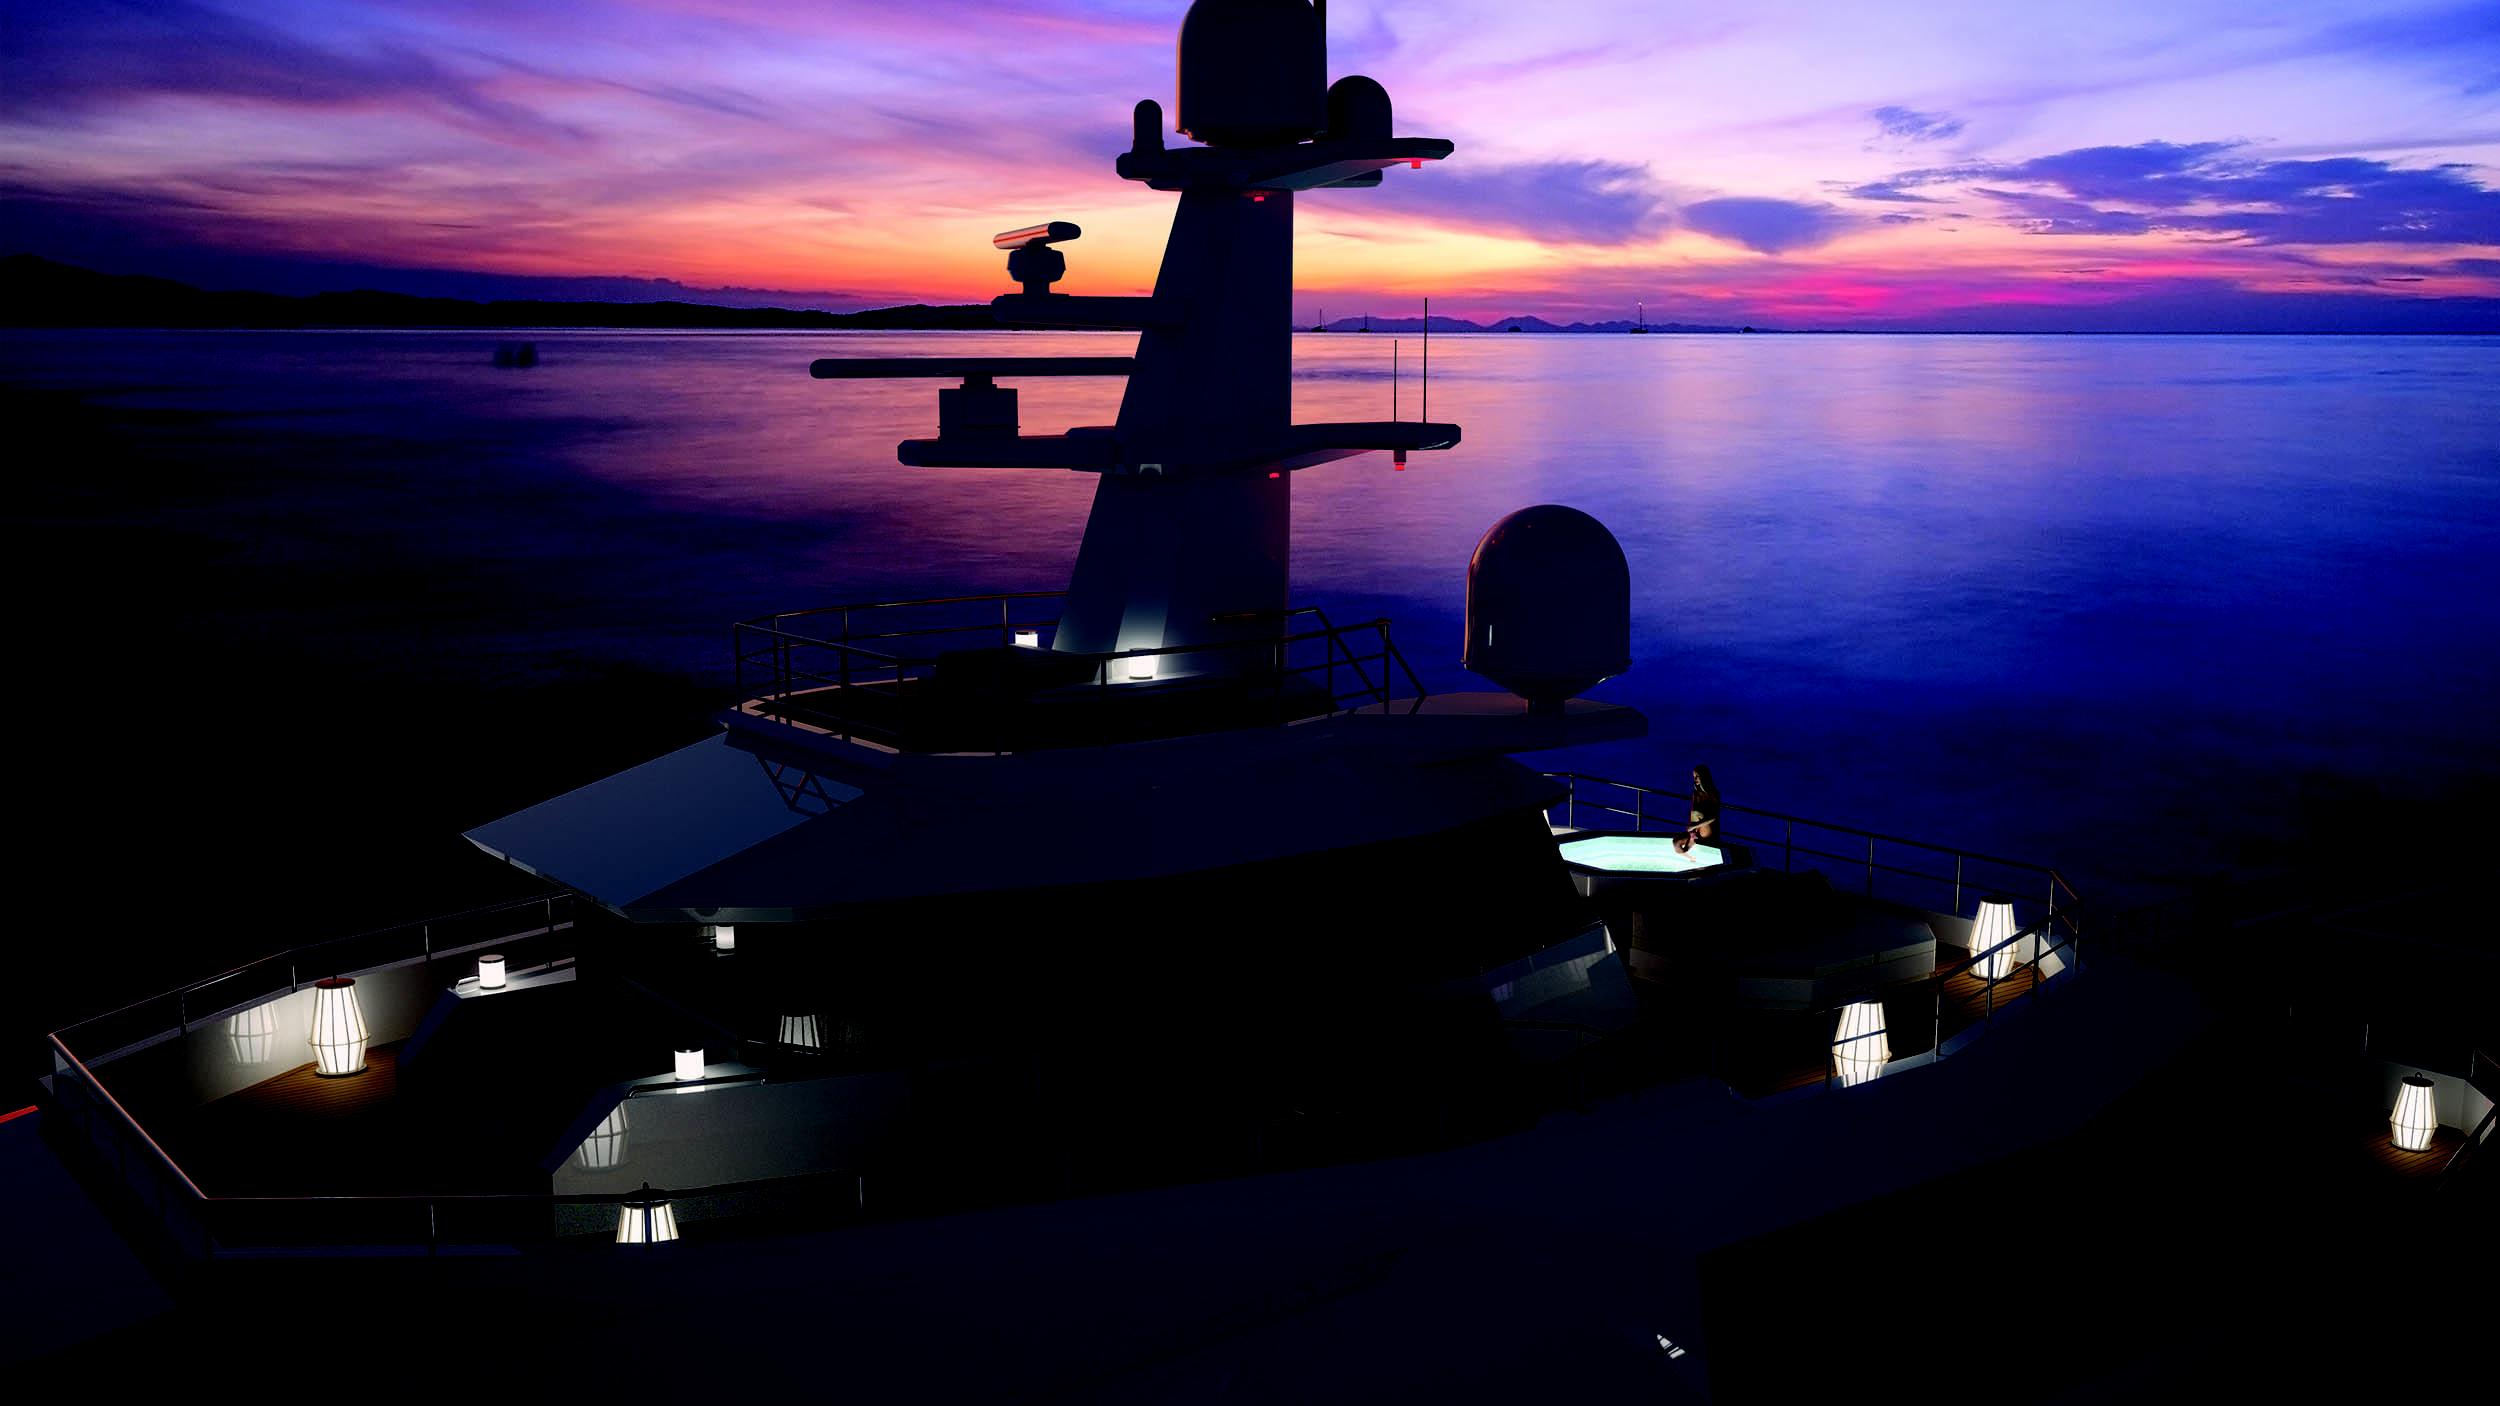 seaxplorer 77 motoryacht damen 77m 2020 rendering sundeck